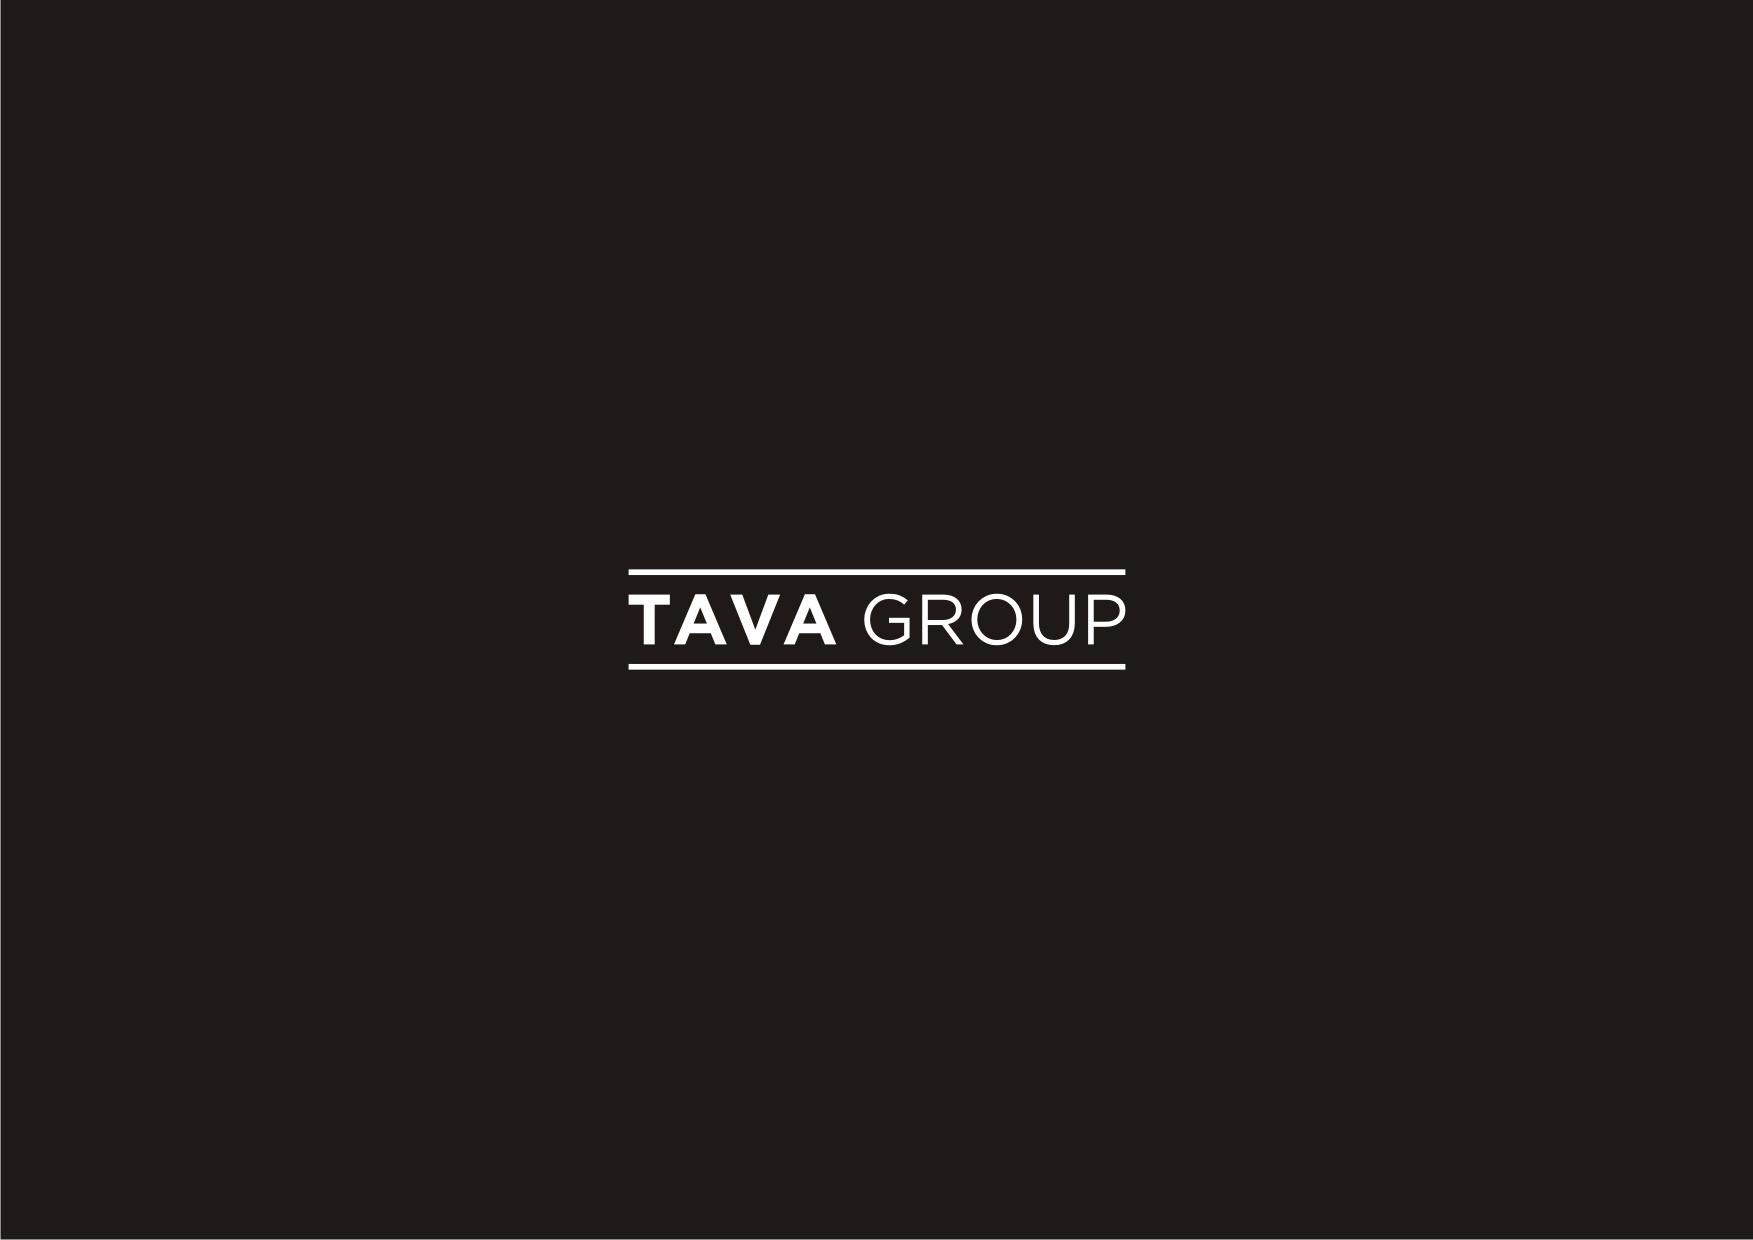 Logo Design by Sigitumarali Sigit - Entry No. 250 in the Logo Design Contest Creative Logo Design for Tava Group.